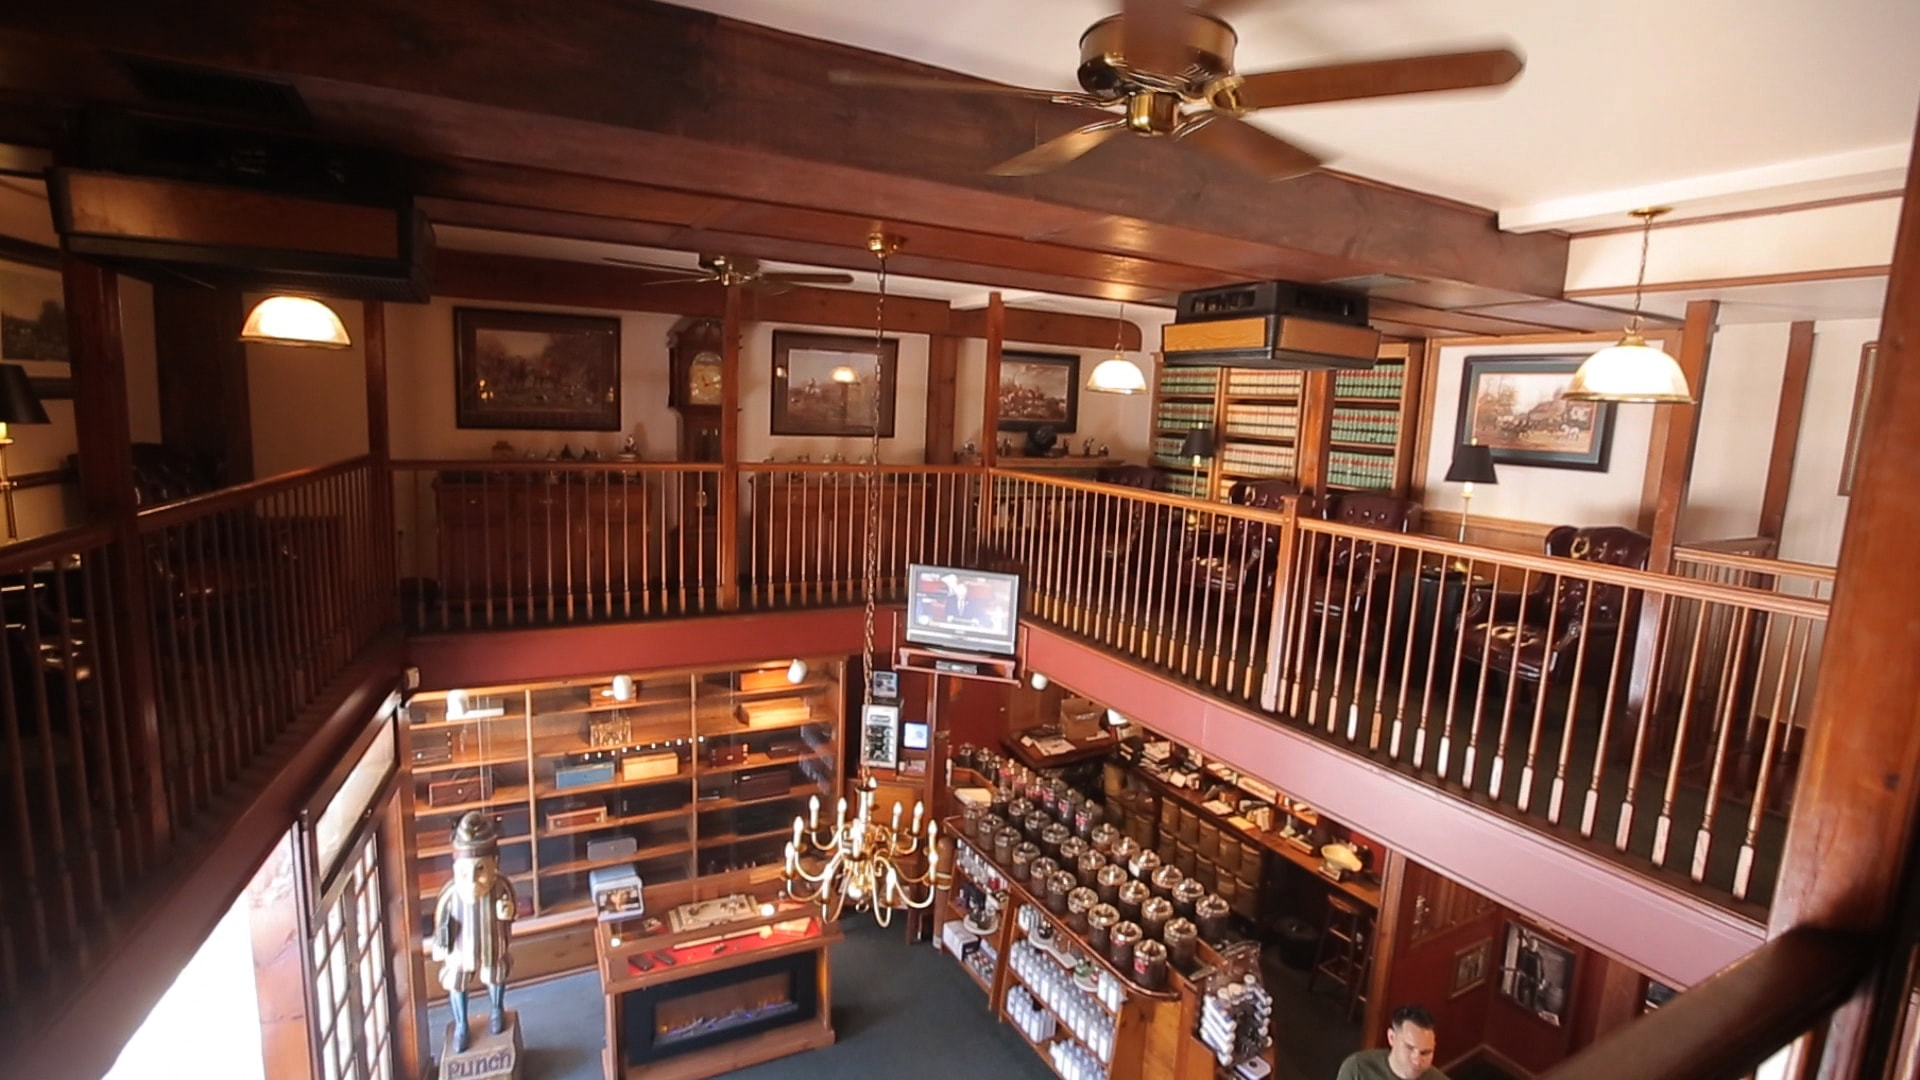 upper mezzanine Cigar Lounge in The Tobacco Shop of Ridgewood-min.jpg